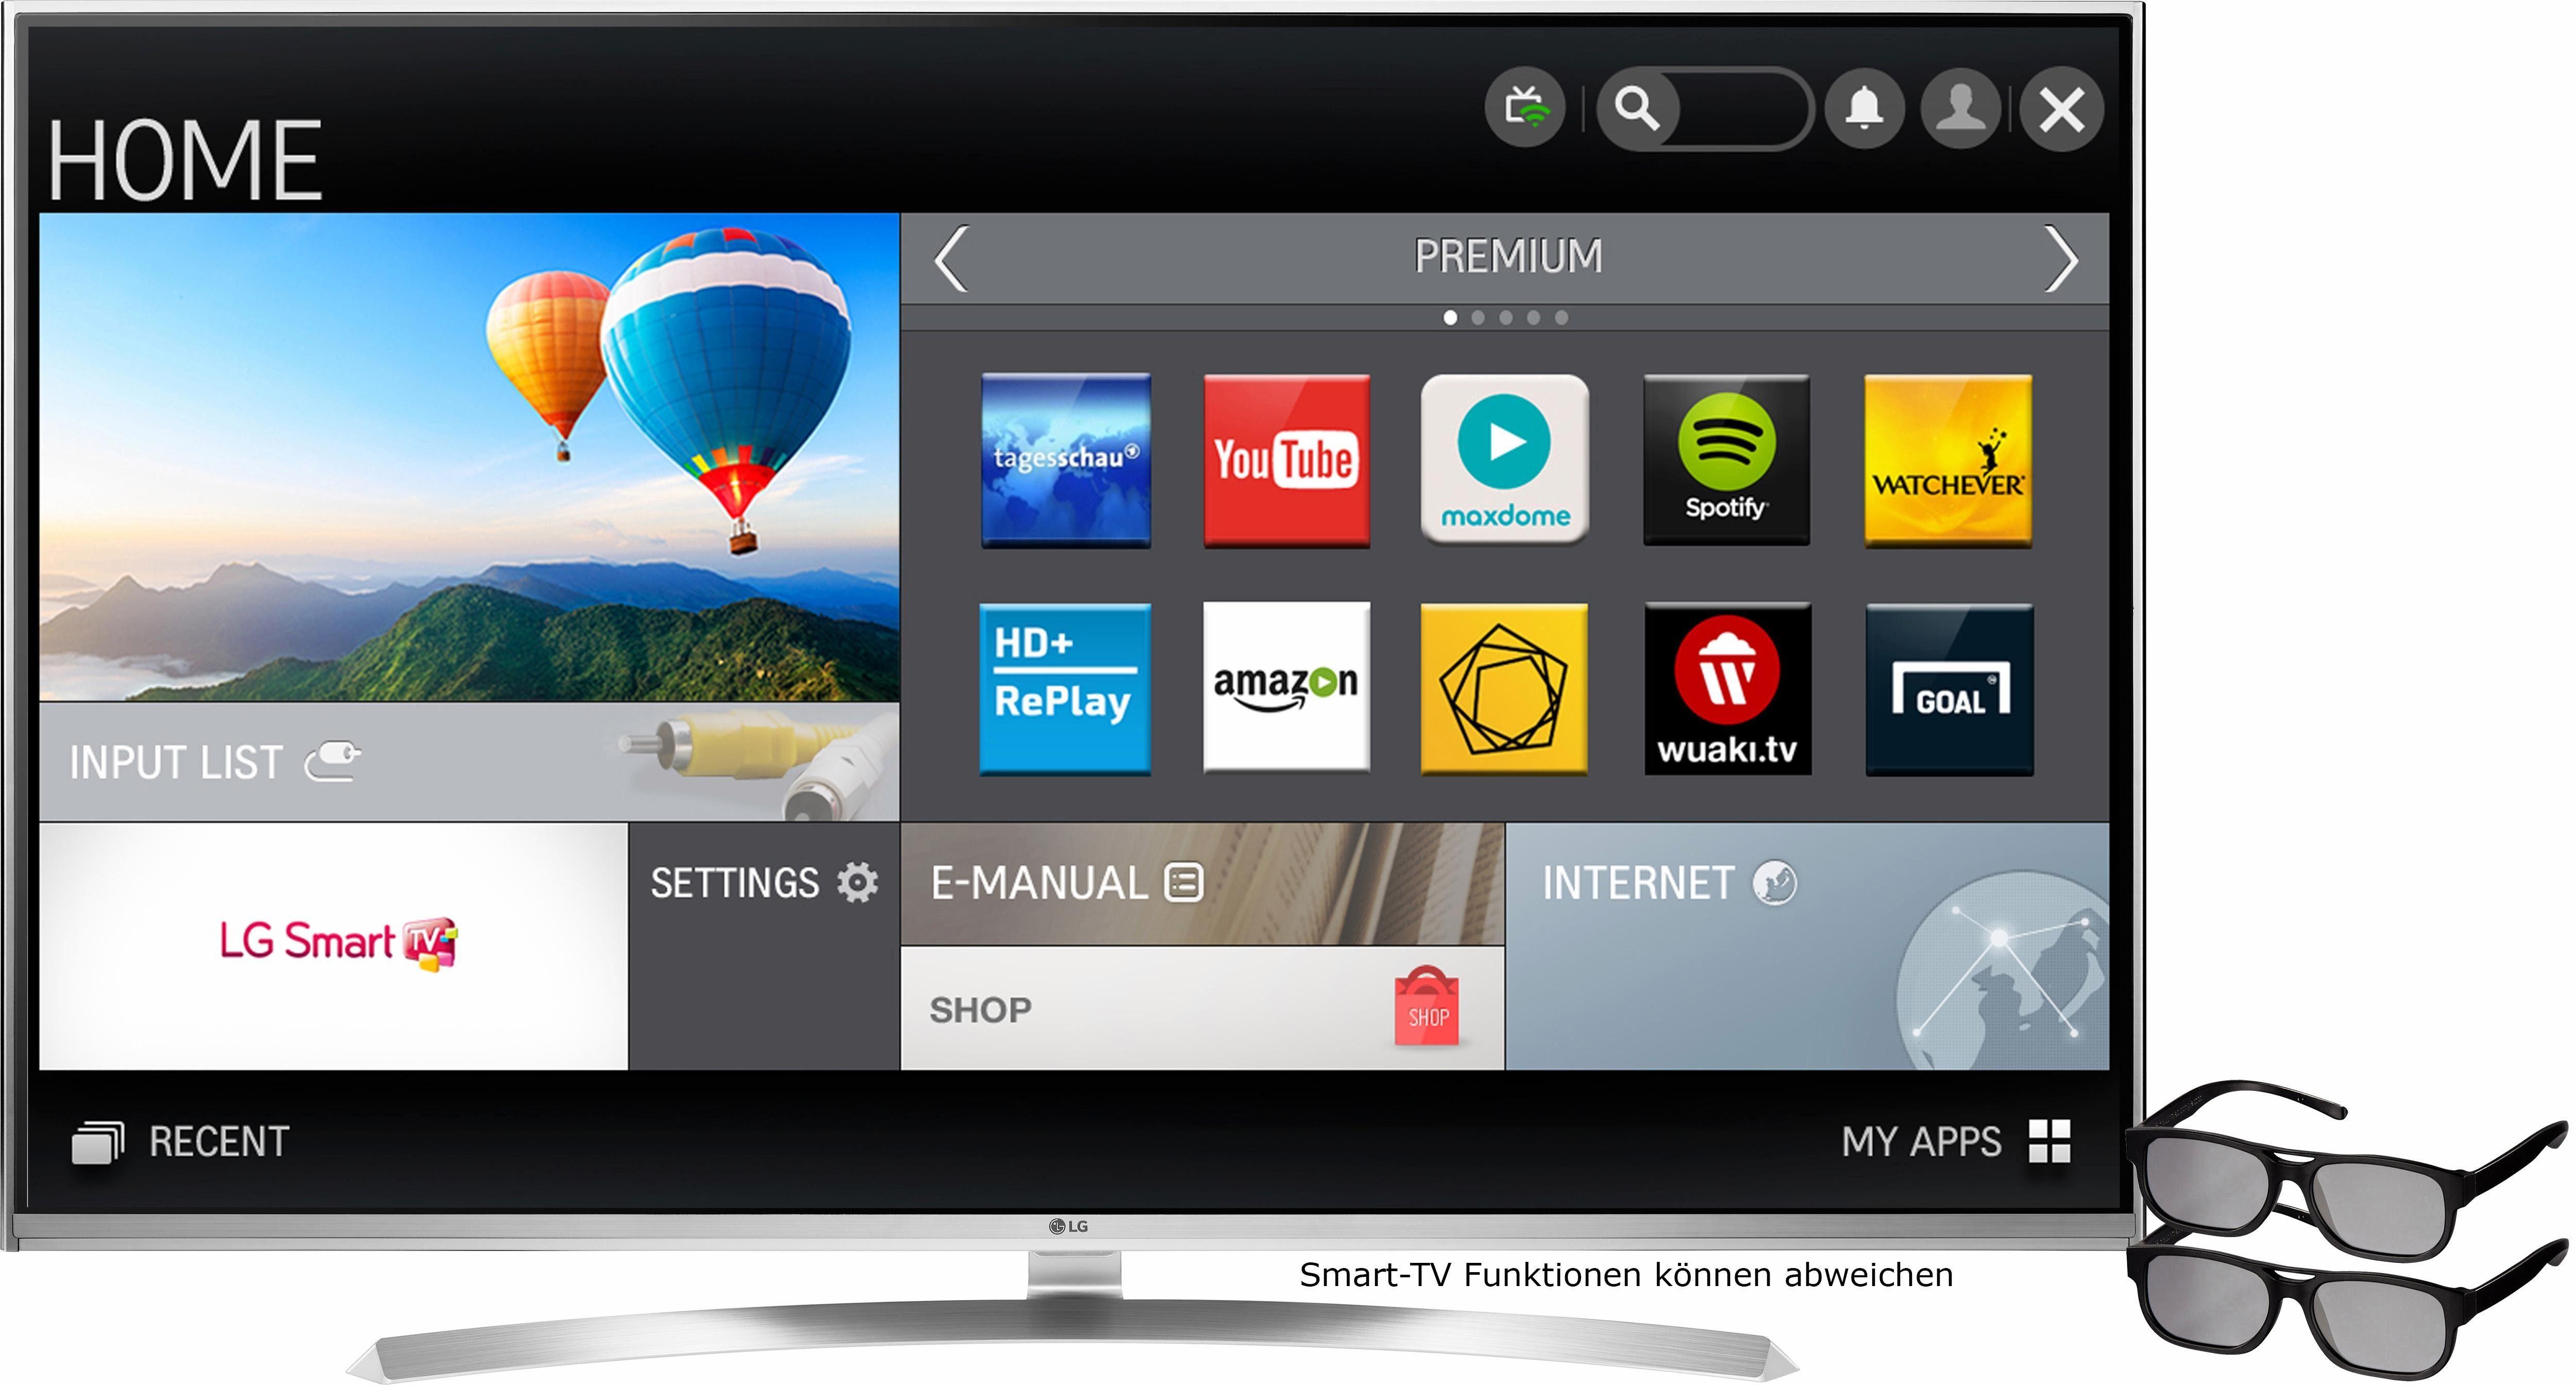 LG 65UH8509, LED Fernseher, 164 cm (65 Zoll), 2160p (4K Ultra HD), Smart-TV